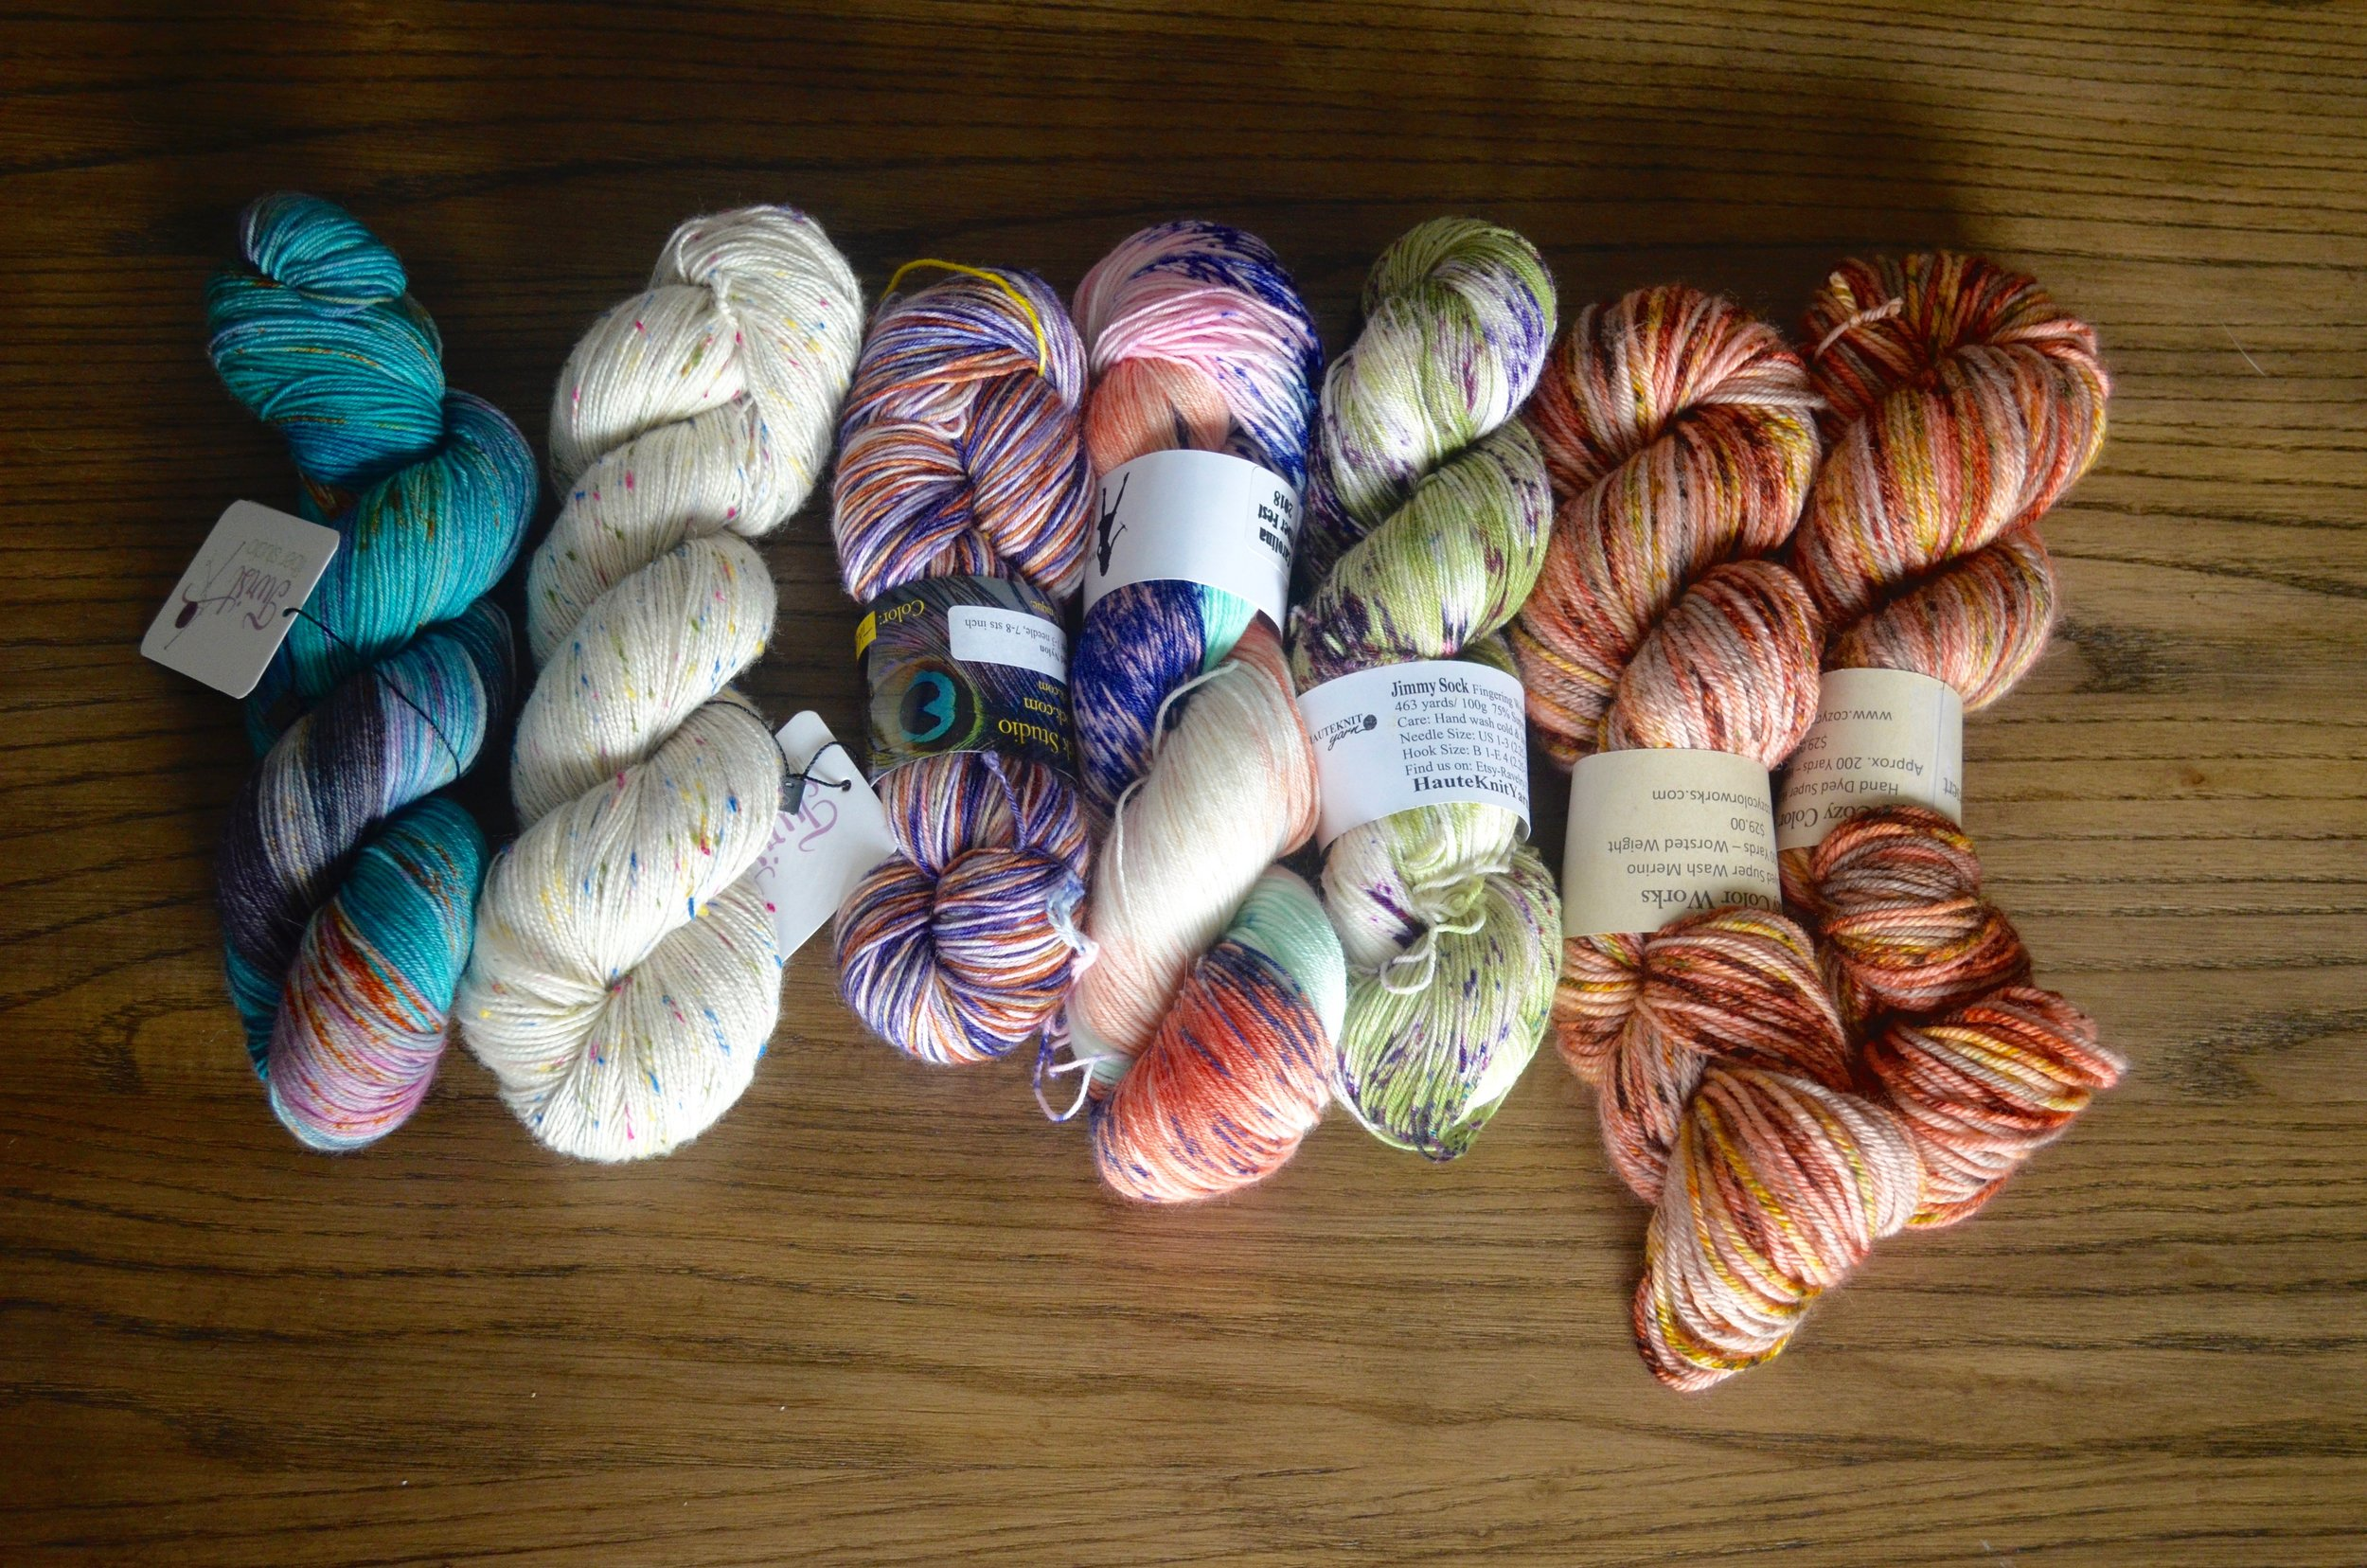 Other yarn from Carolina Fiber Fest